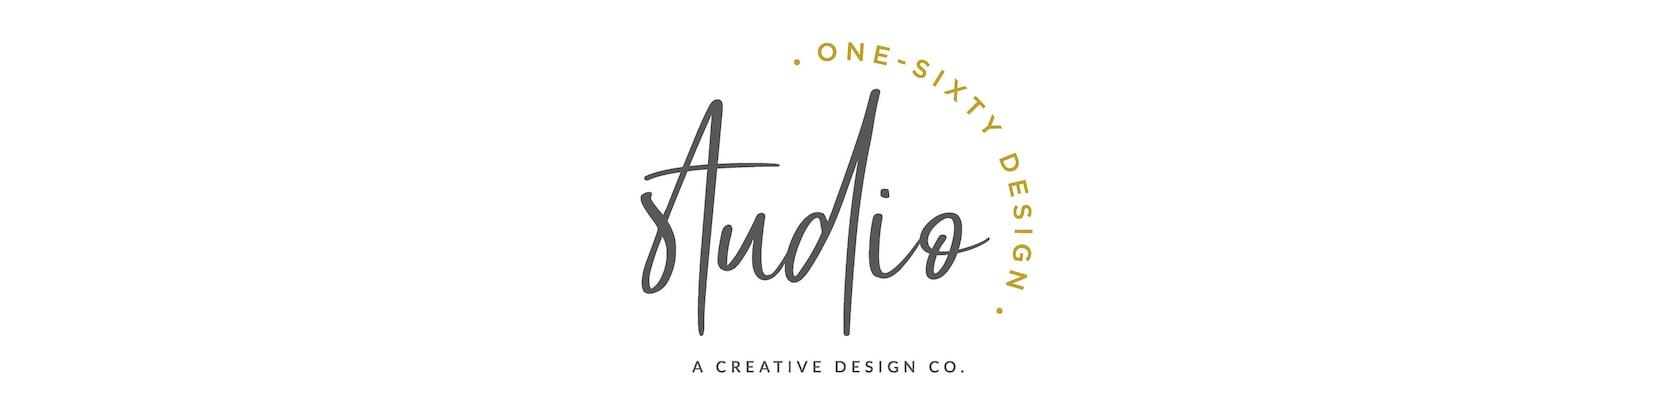 Custom Logo Design Creative Business Branding By Studio160design